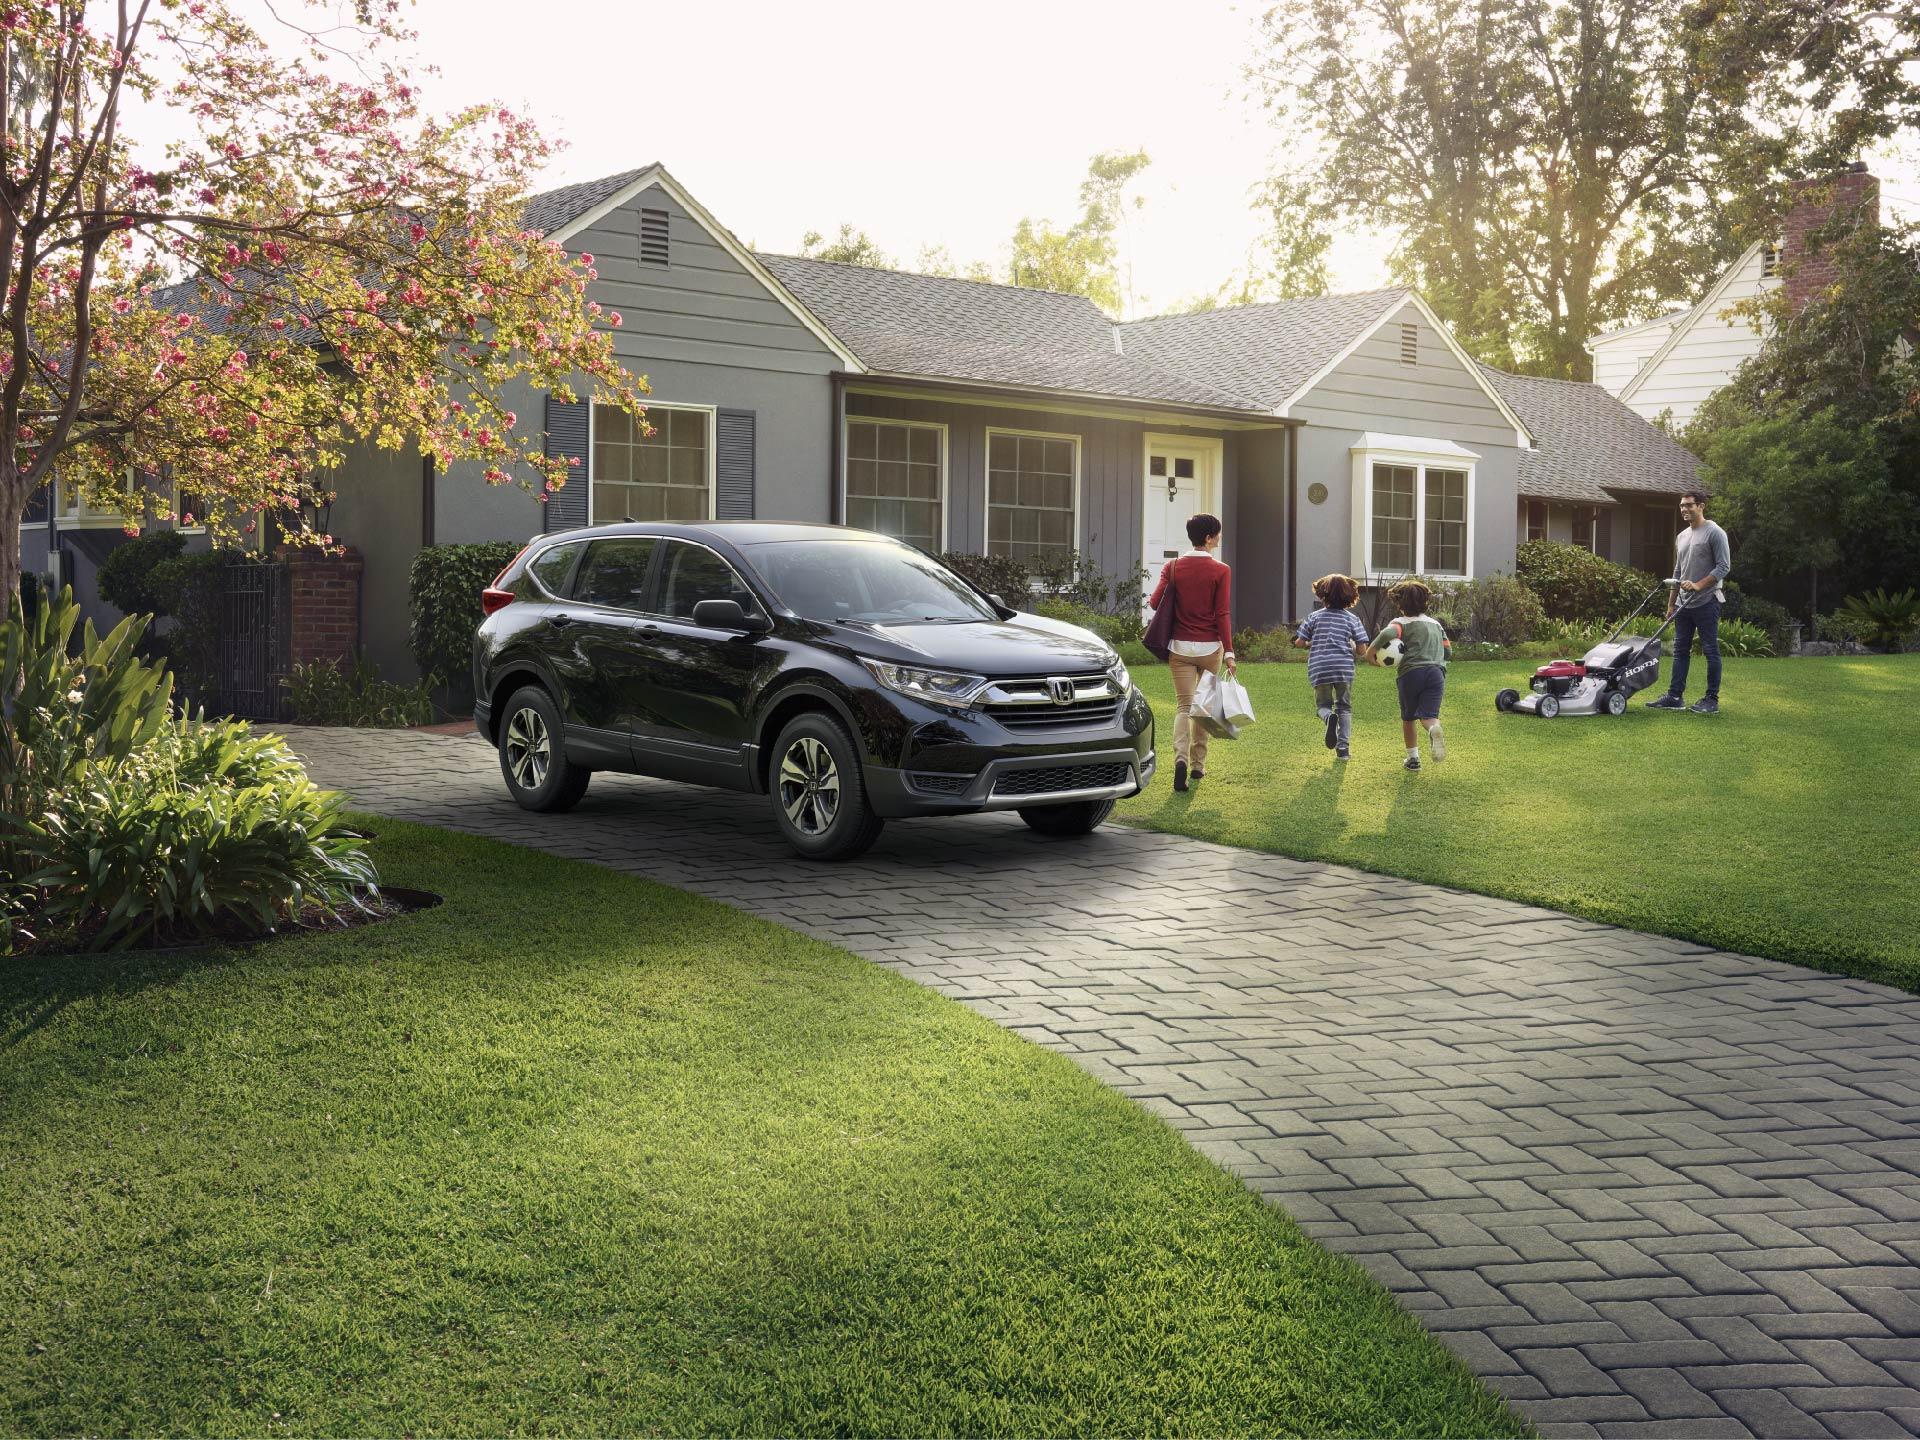 New Honda CR V On Sale Now At Rairdon Of Sumner